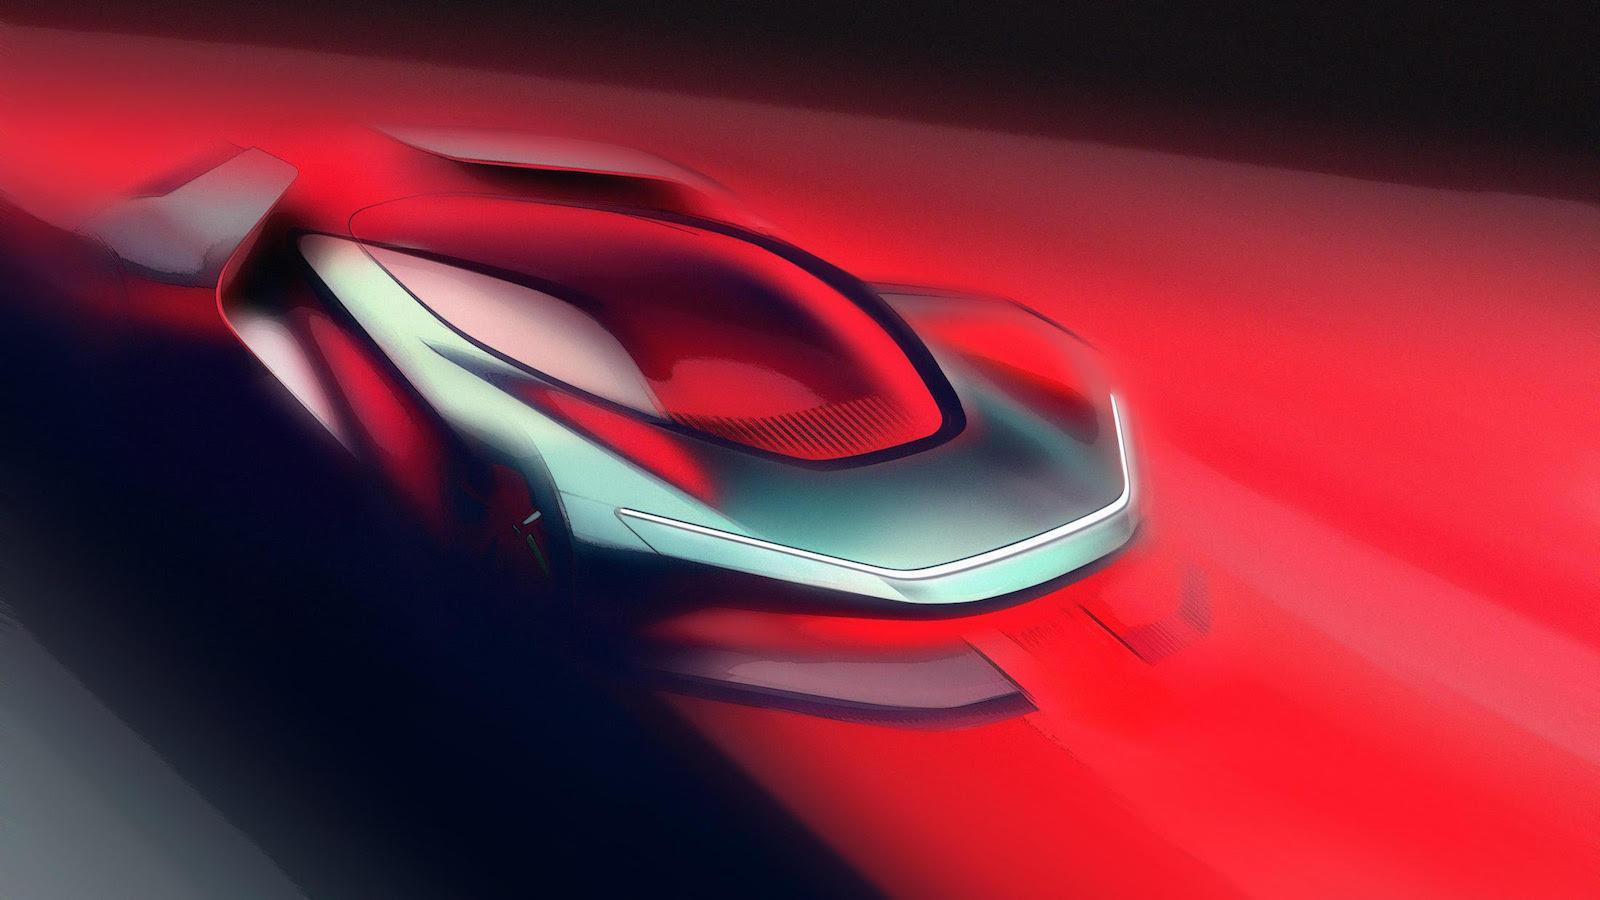 First teasers of Automobili Pininfarina's new 2000bhp hypercar